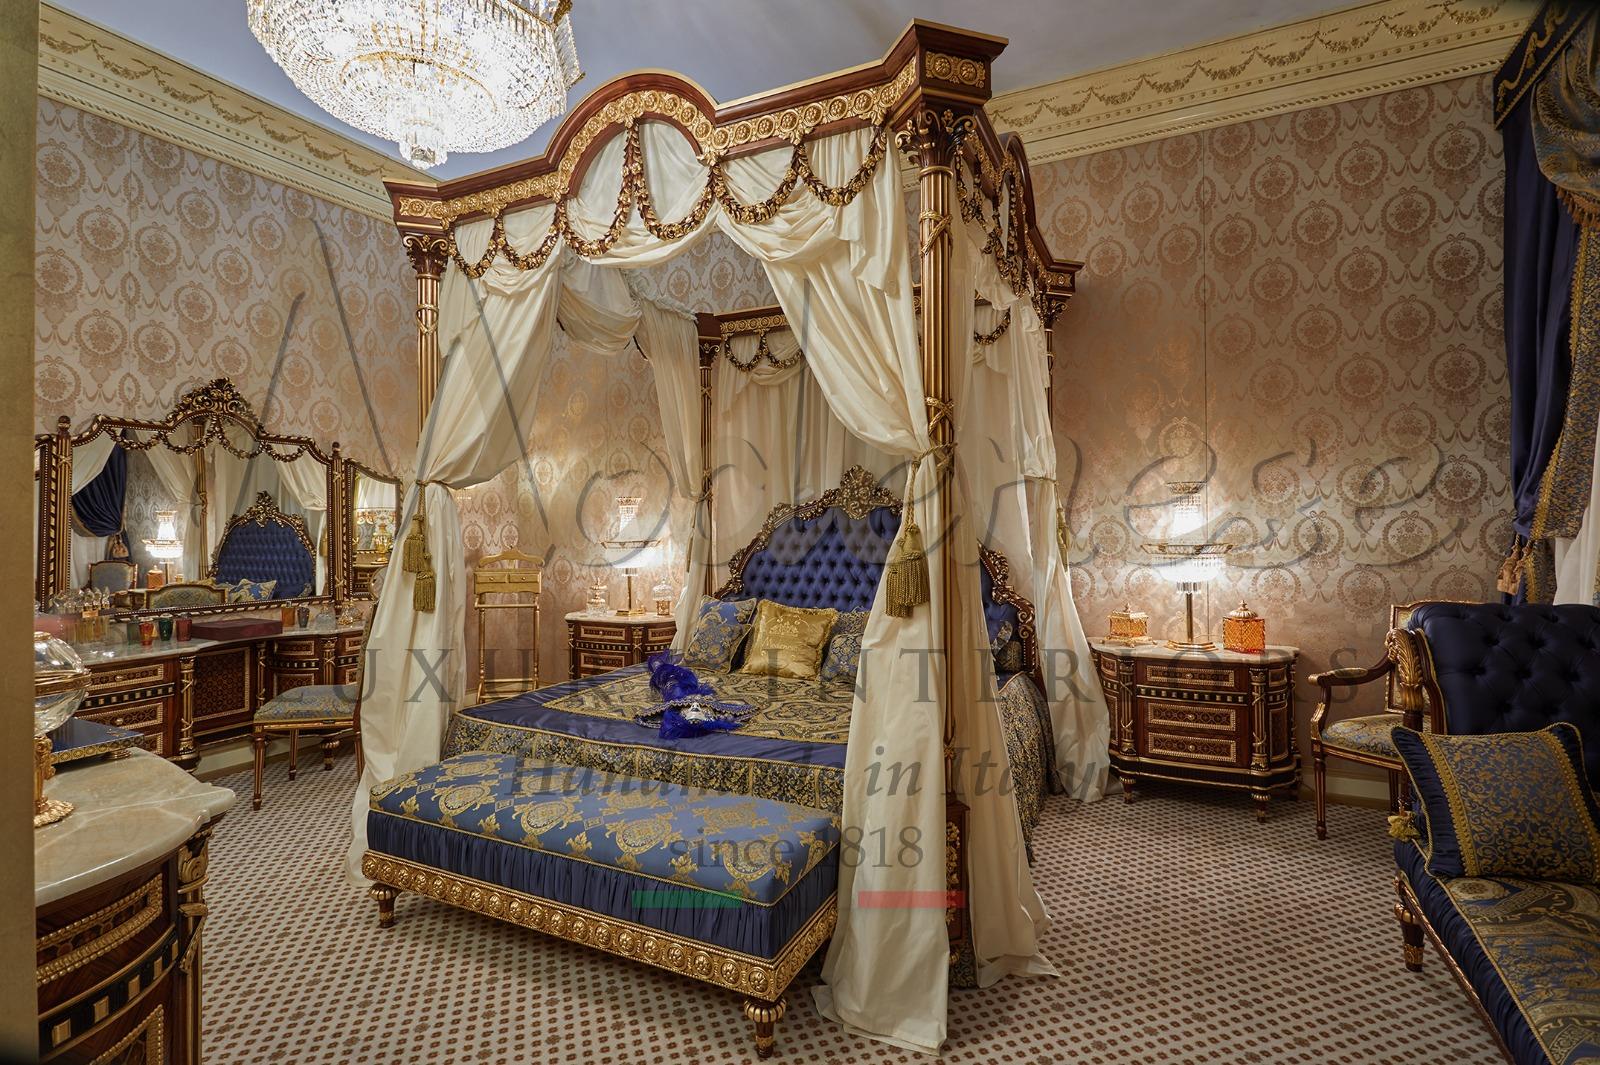 salone del mobile luxury Italian interiors Milan exhibition design week Italy interior design projects villa palace home décor